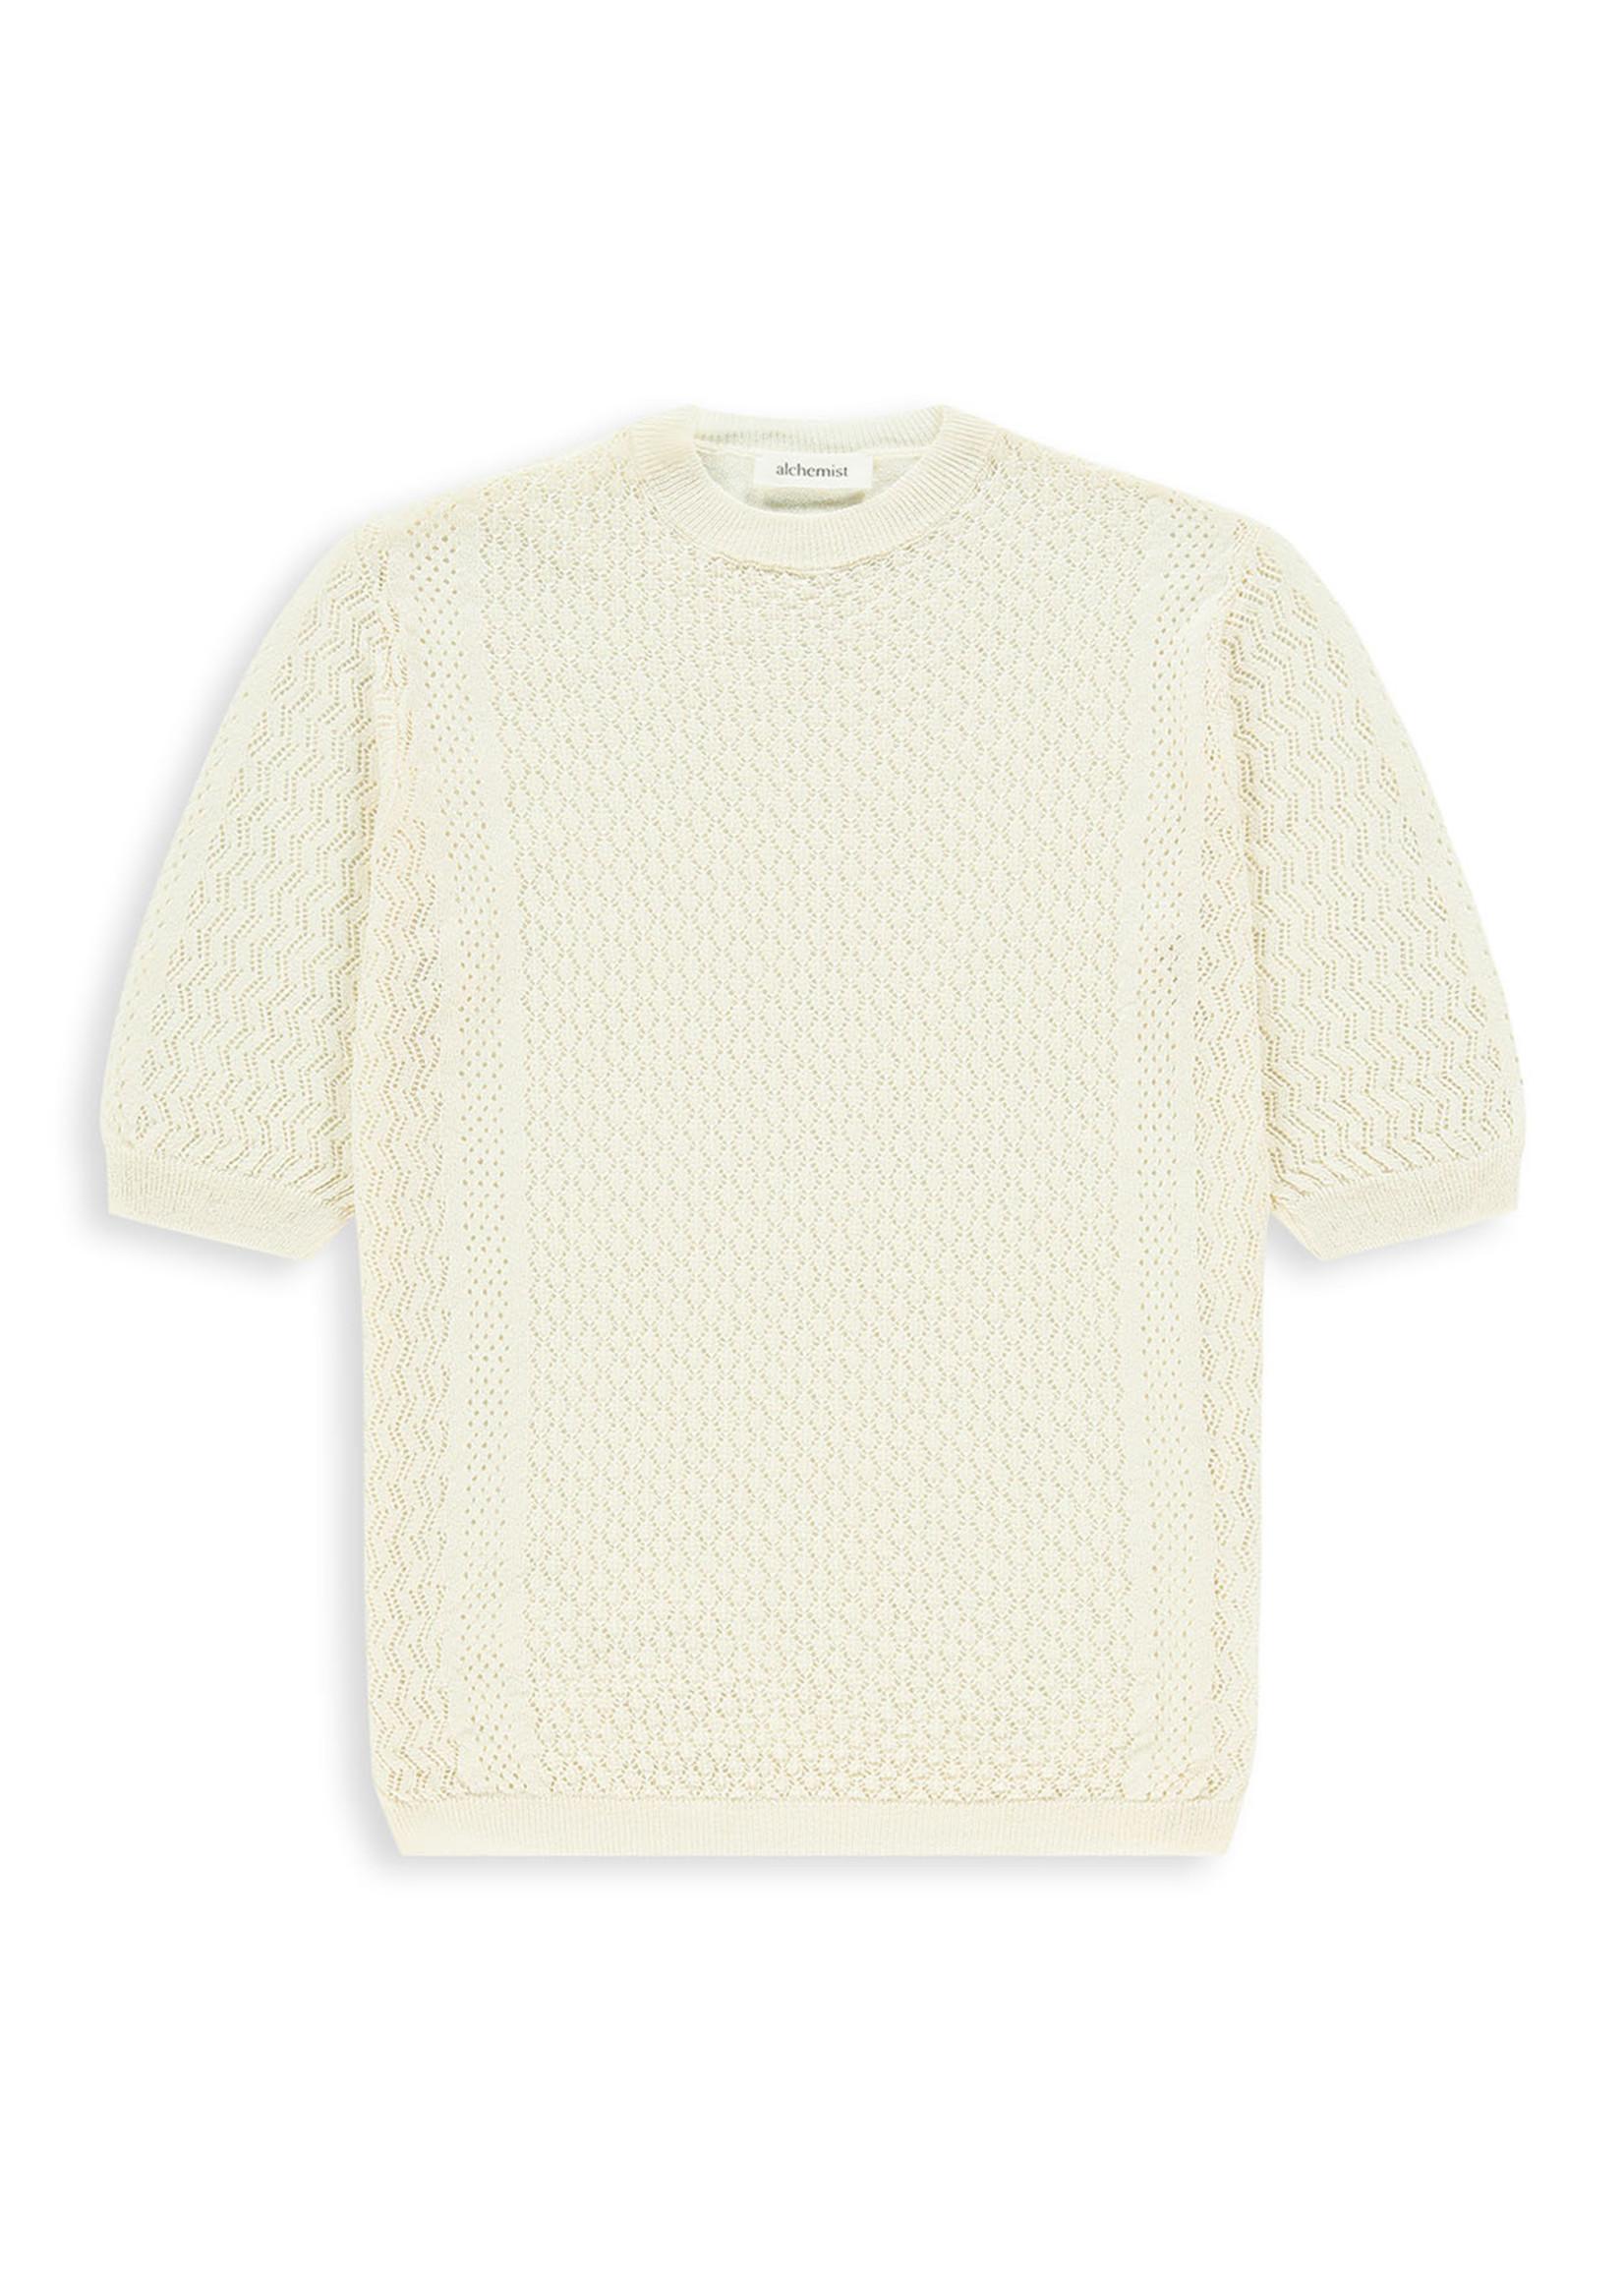 Alchemist Beasley Sweater